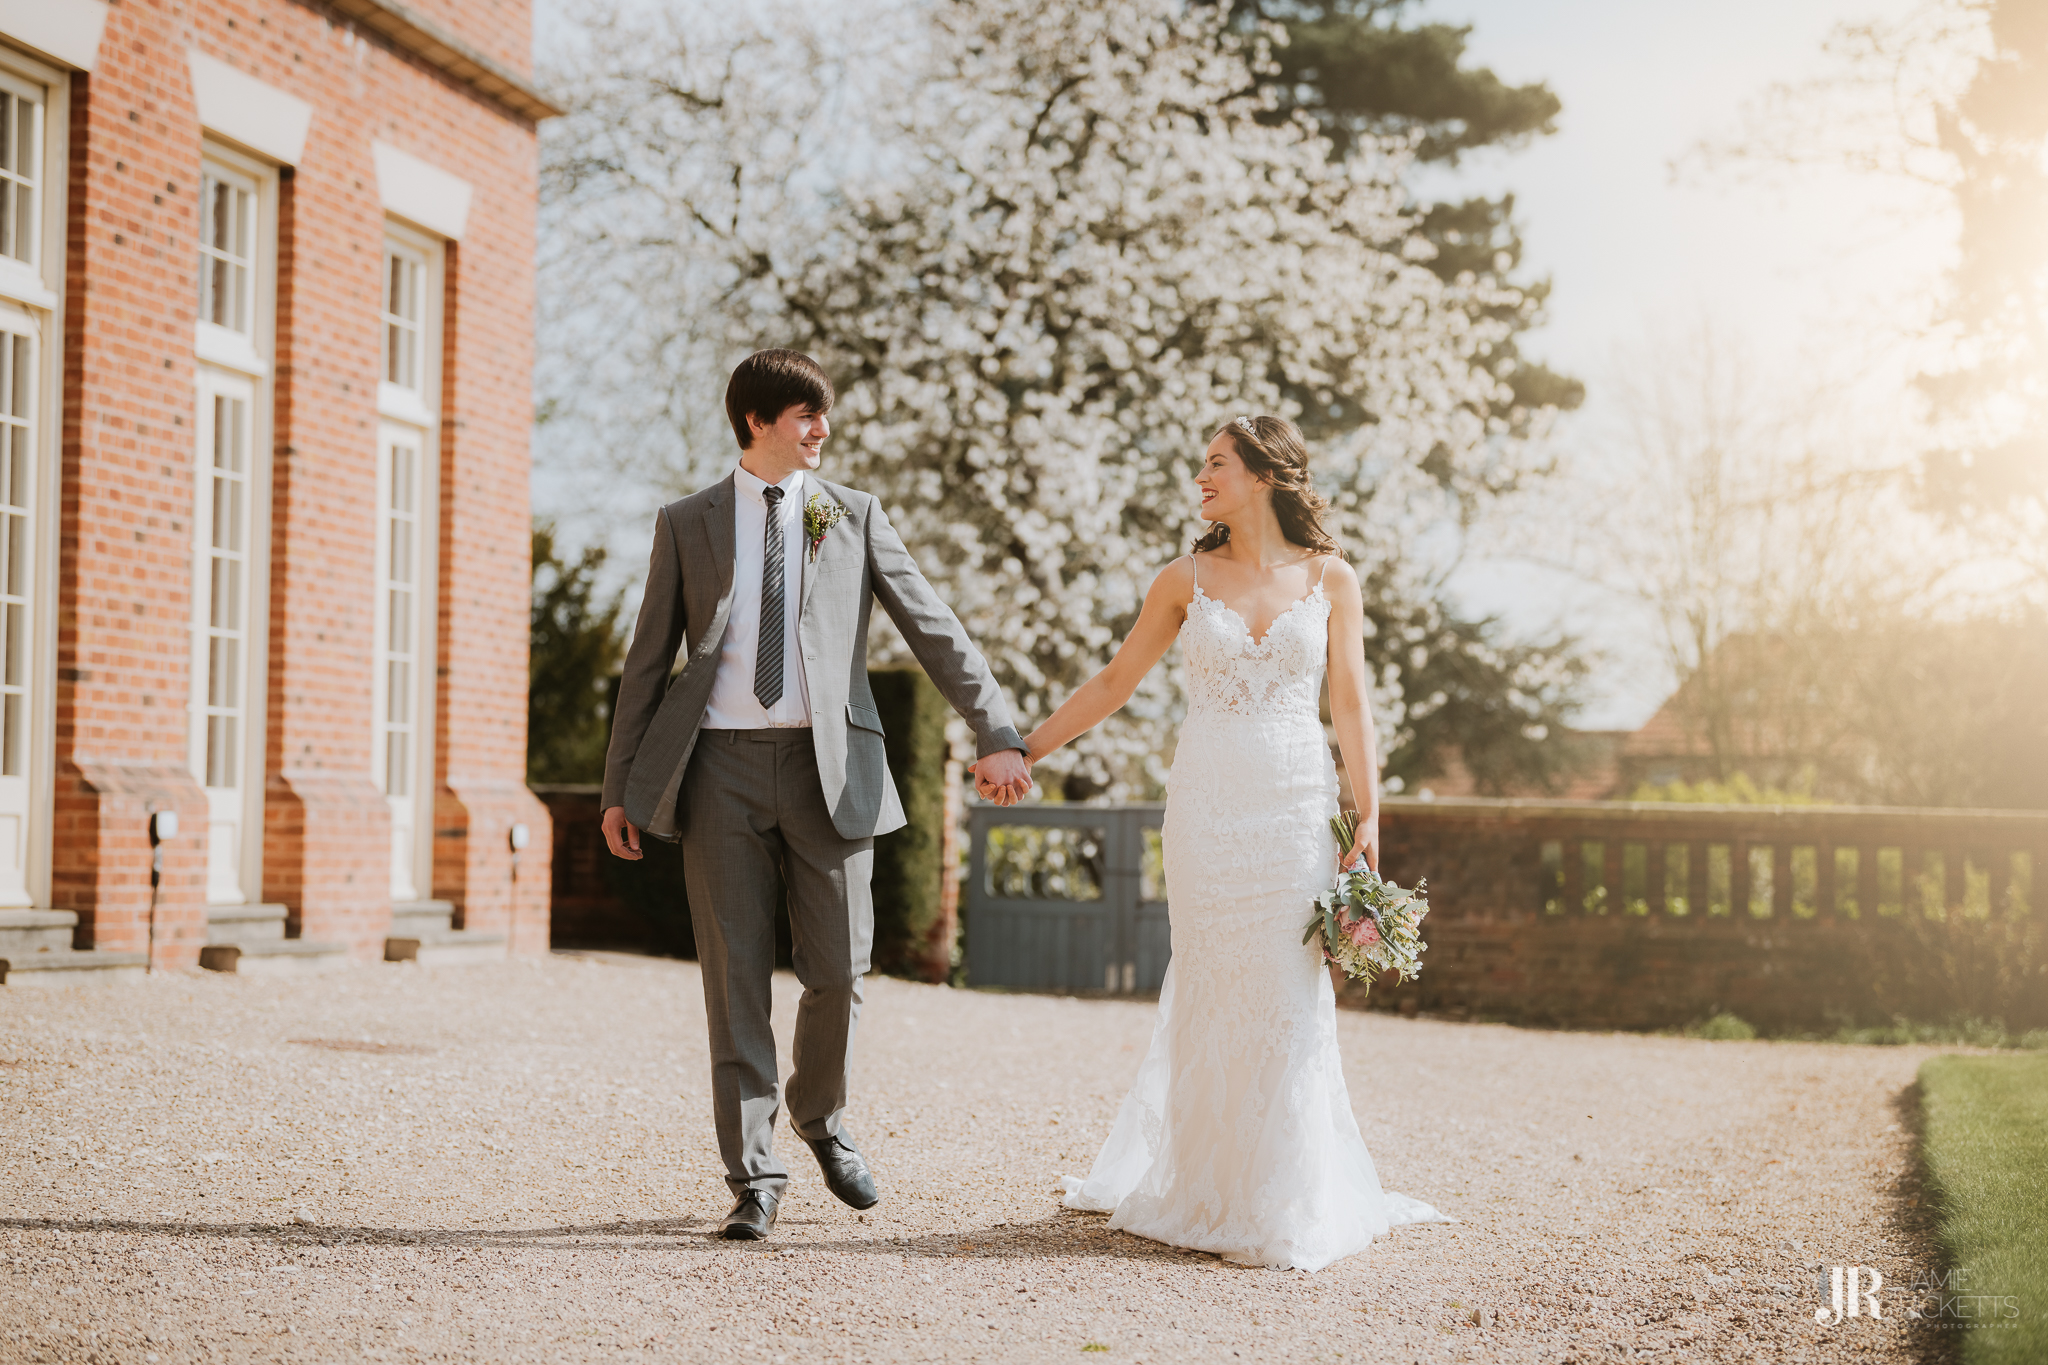 Wedding-Photographer-Shropshire-5.JPG